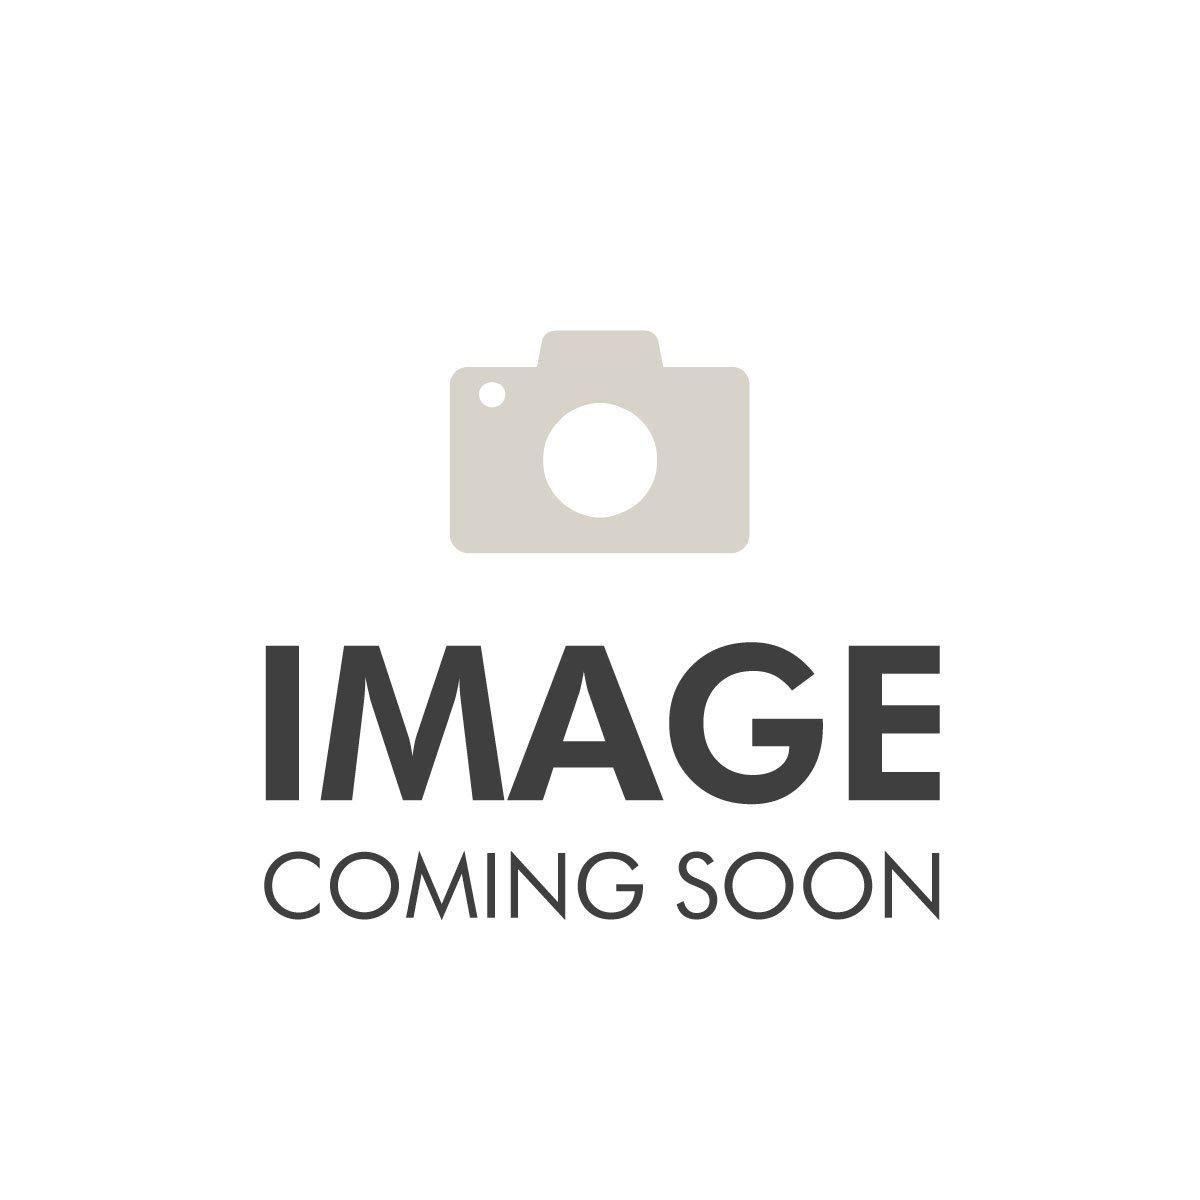 L'Oreal Color Riche Lipstick 5ml - Ardent Sunset